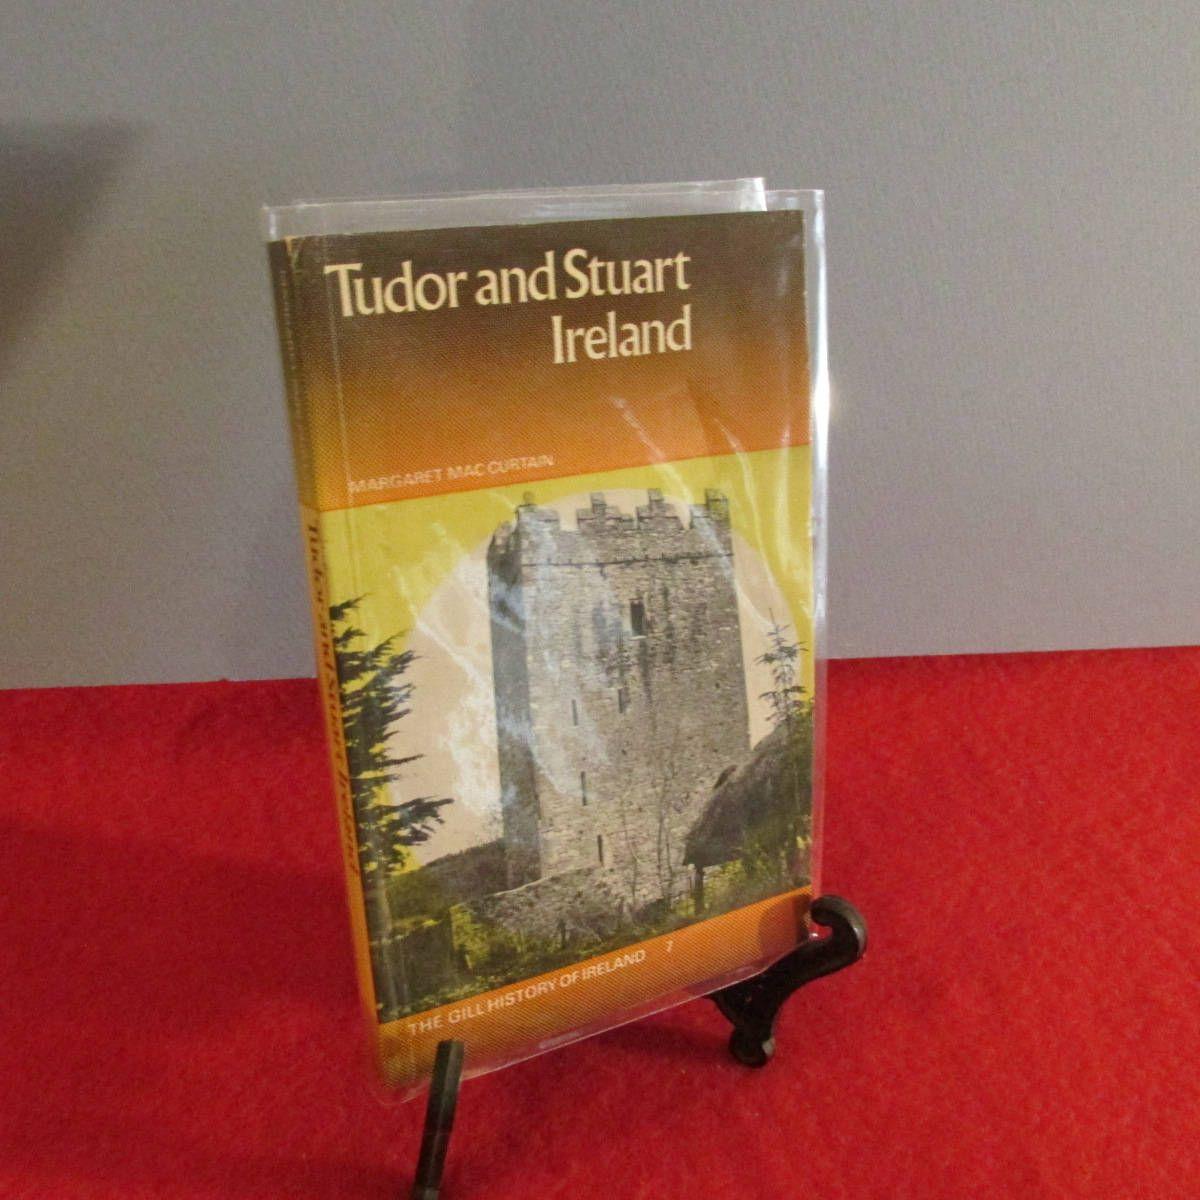 Tudor and Stuart Ireland by Margaret Mac Curtain Ireland